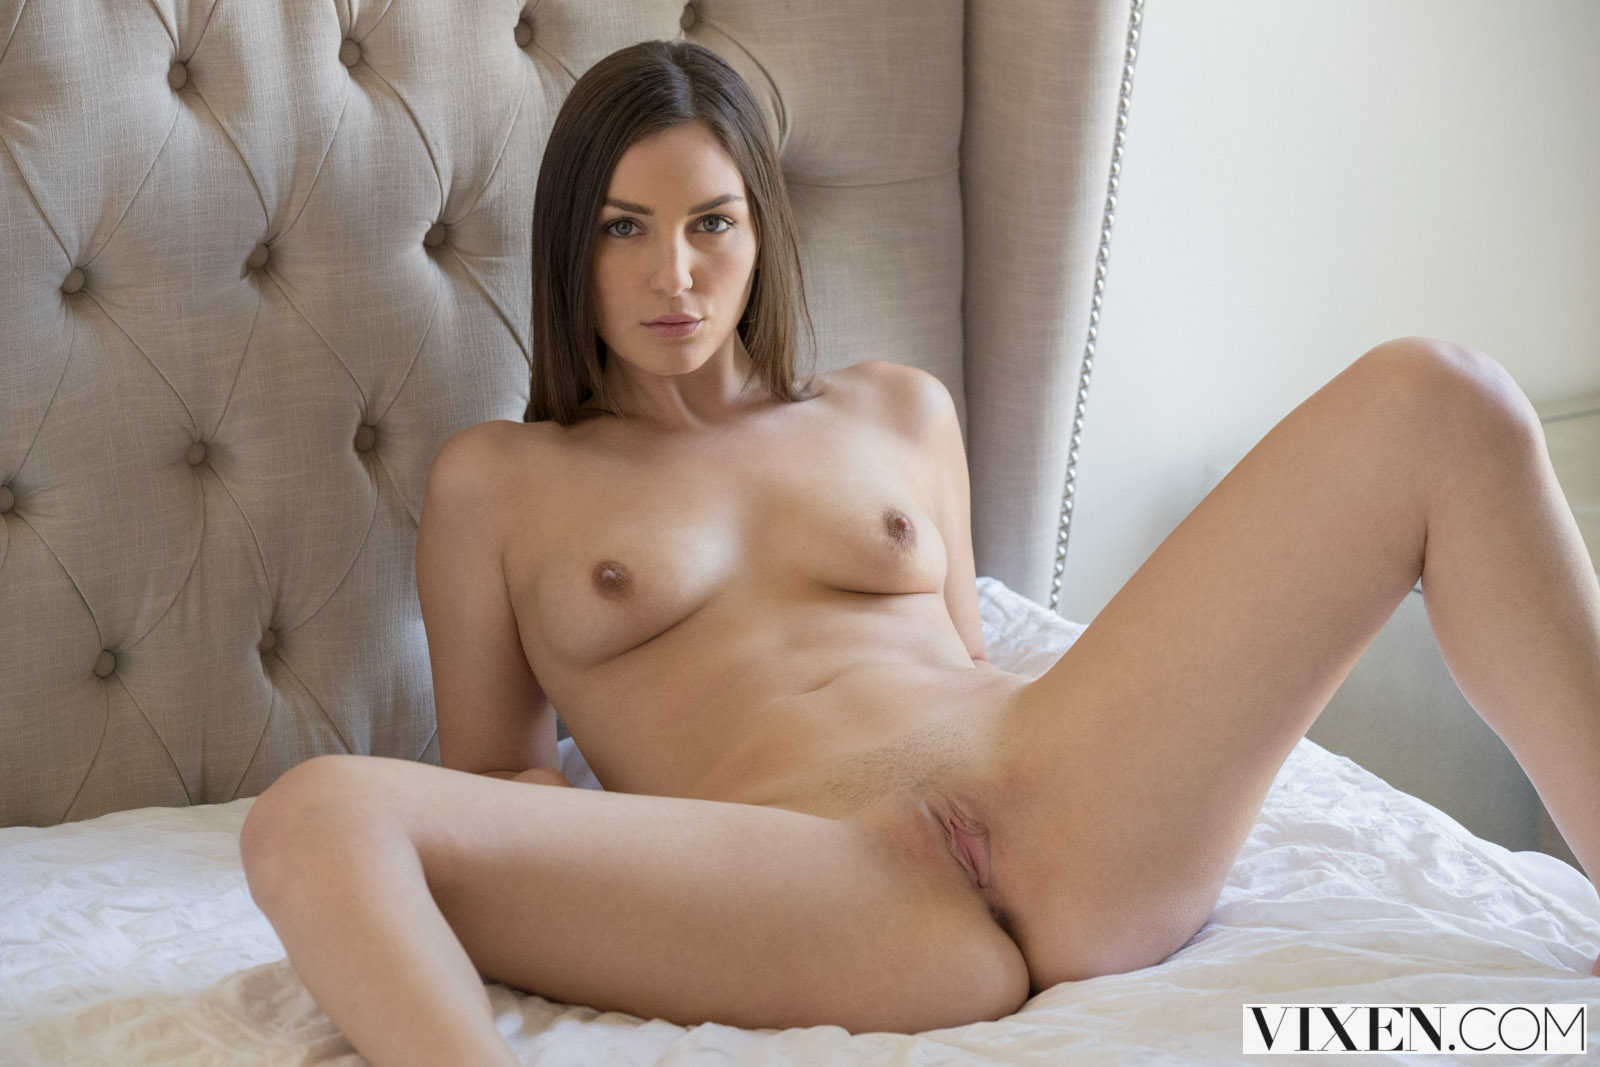 daughter sex nude photo